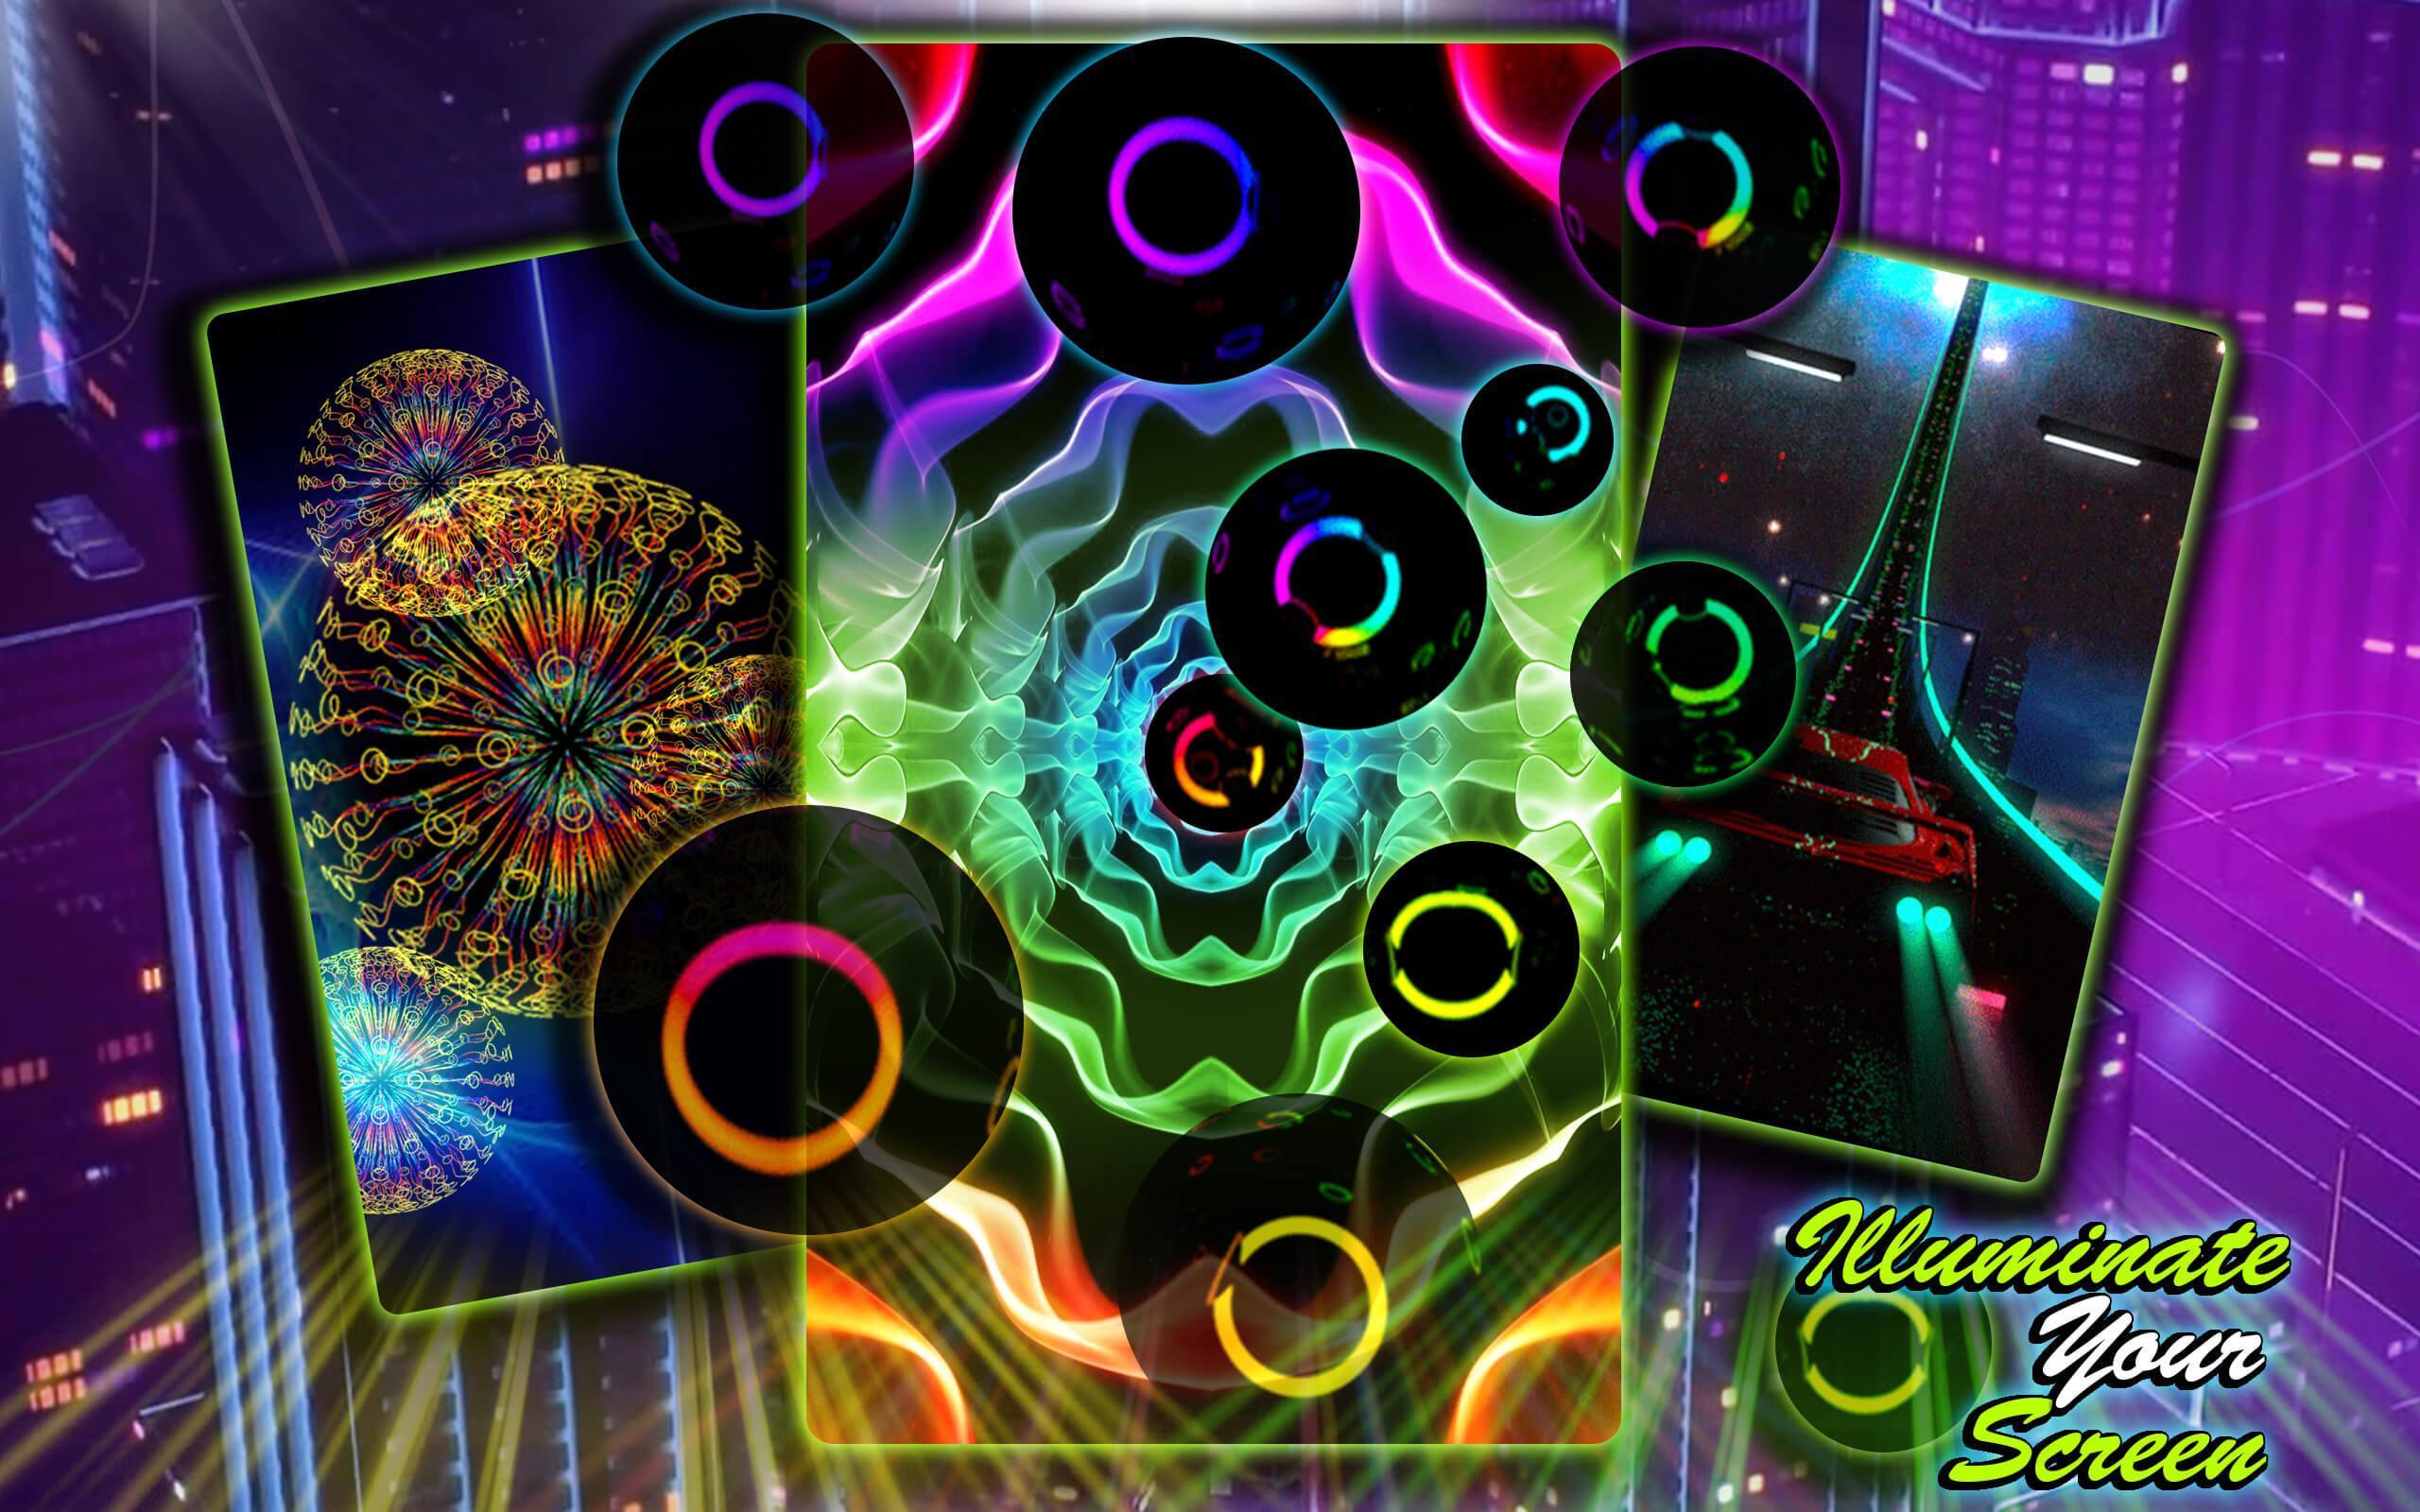 Wallpaper Neon Hidup 📱 Gambar Animasi For Android APK